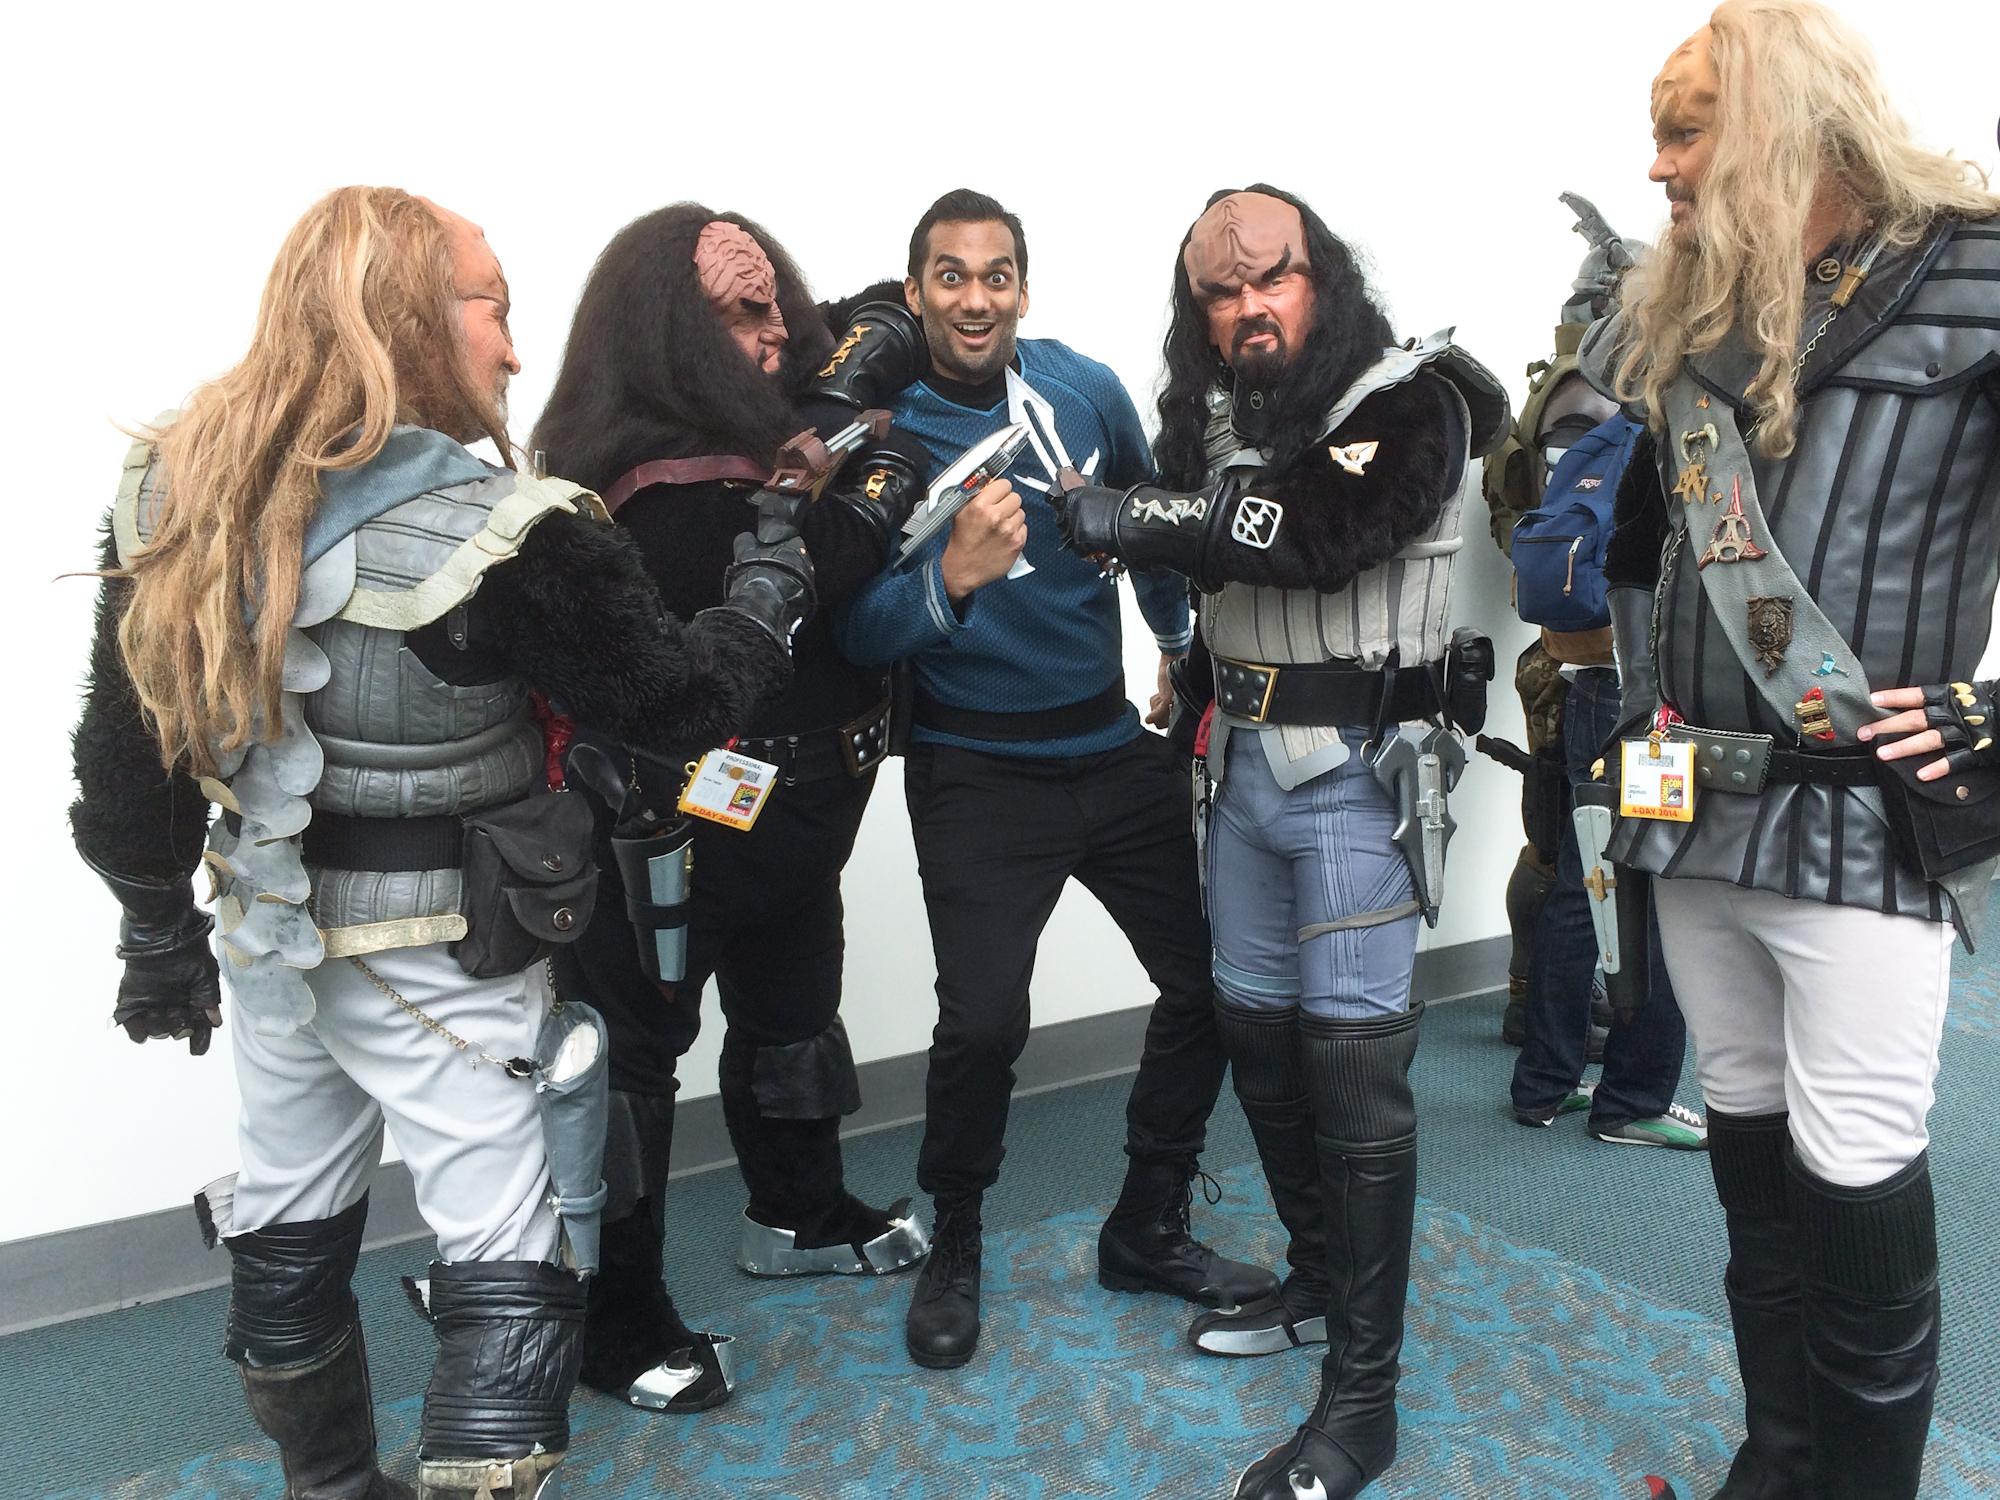 star-trek-cosplay-klingons-san-diego-comic-con.jpg